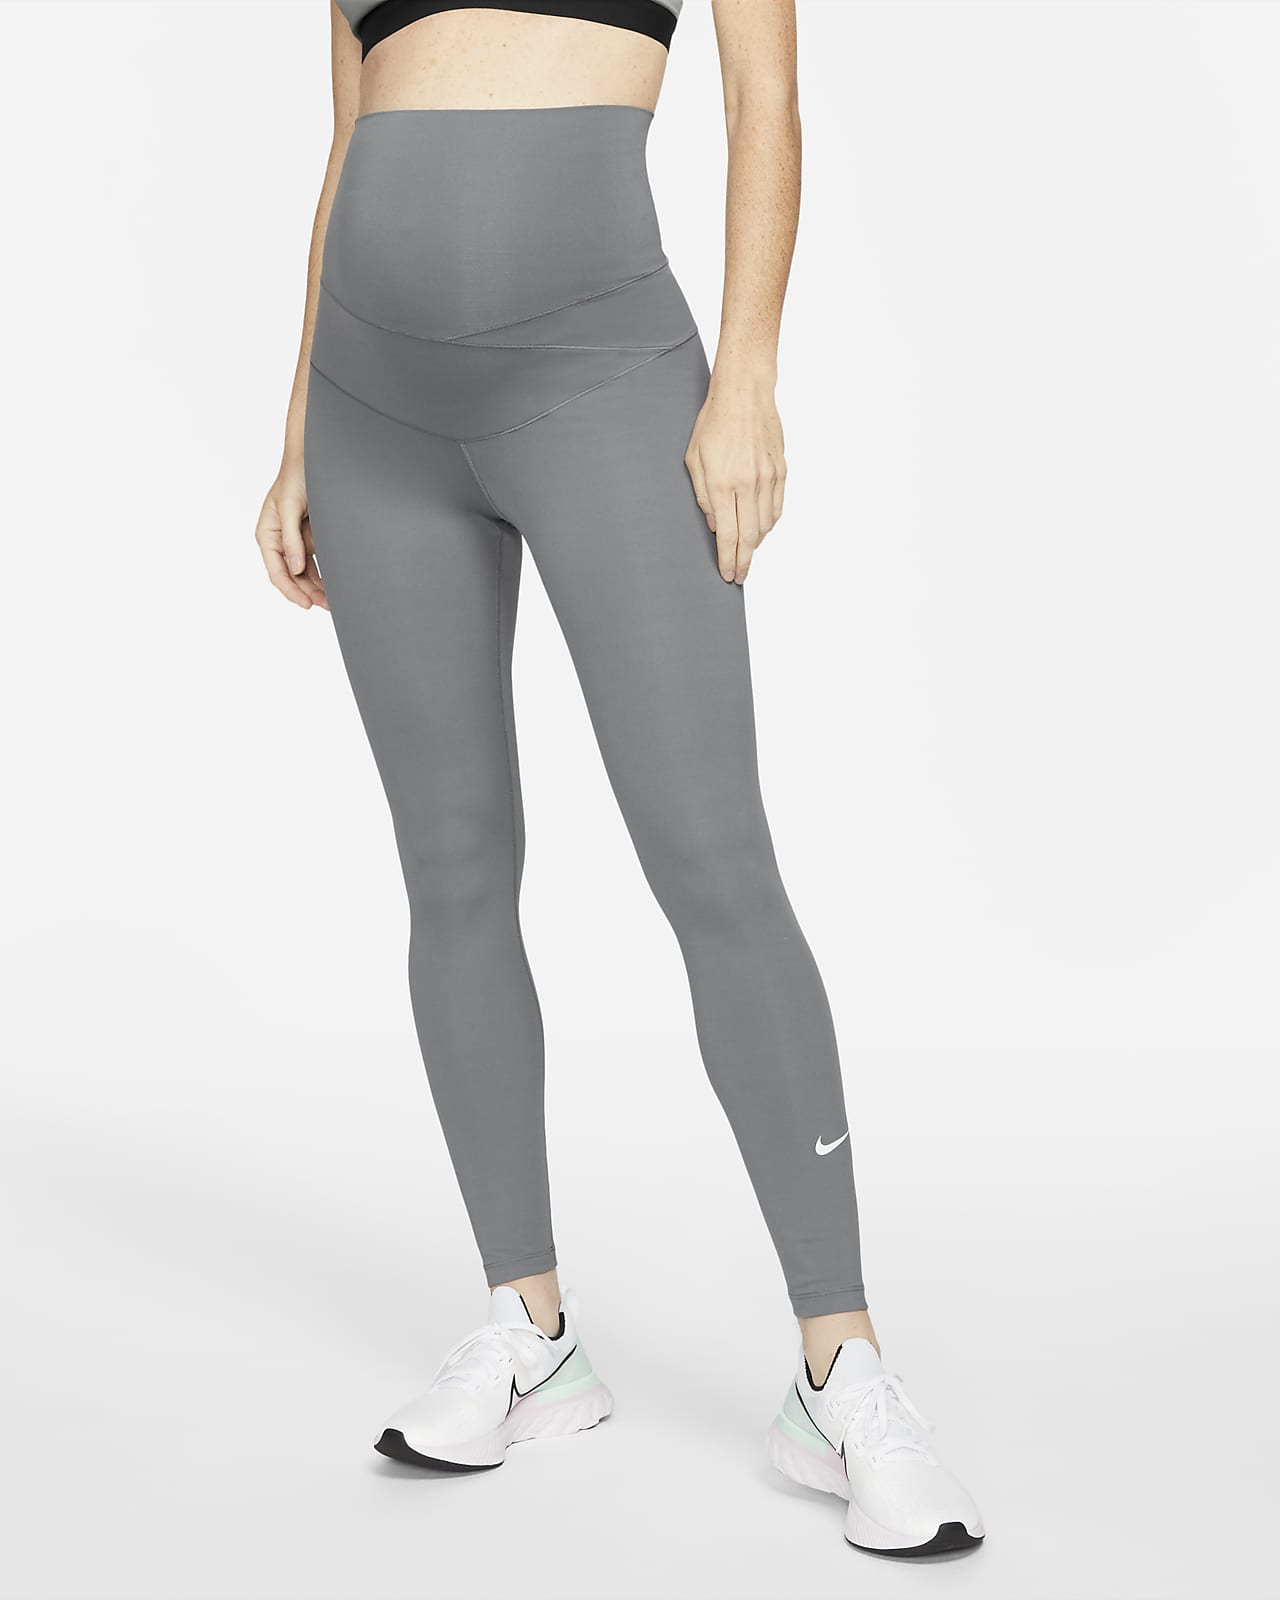 Nike One (M) Leggings (Maternity) - Dona